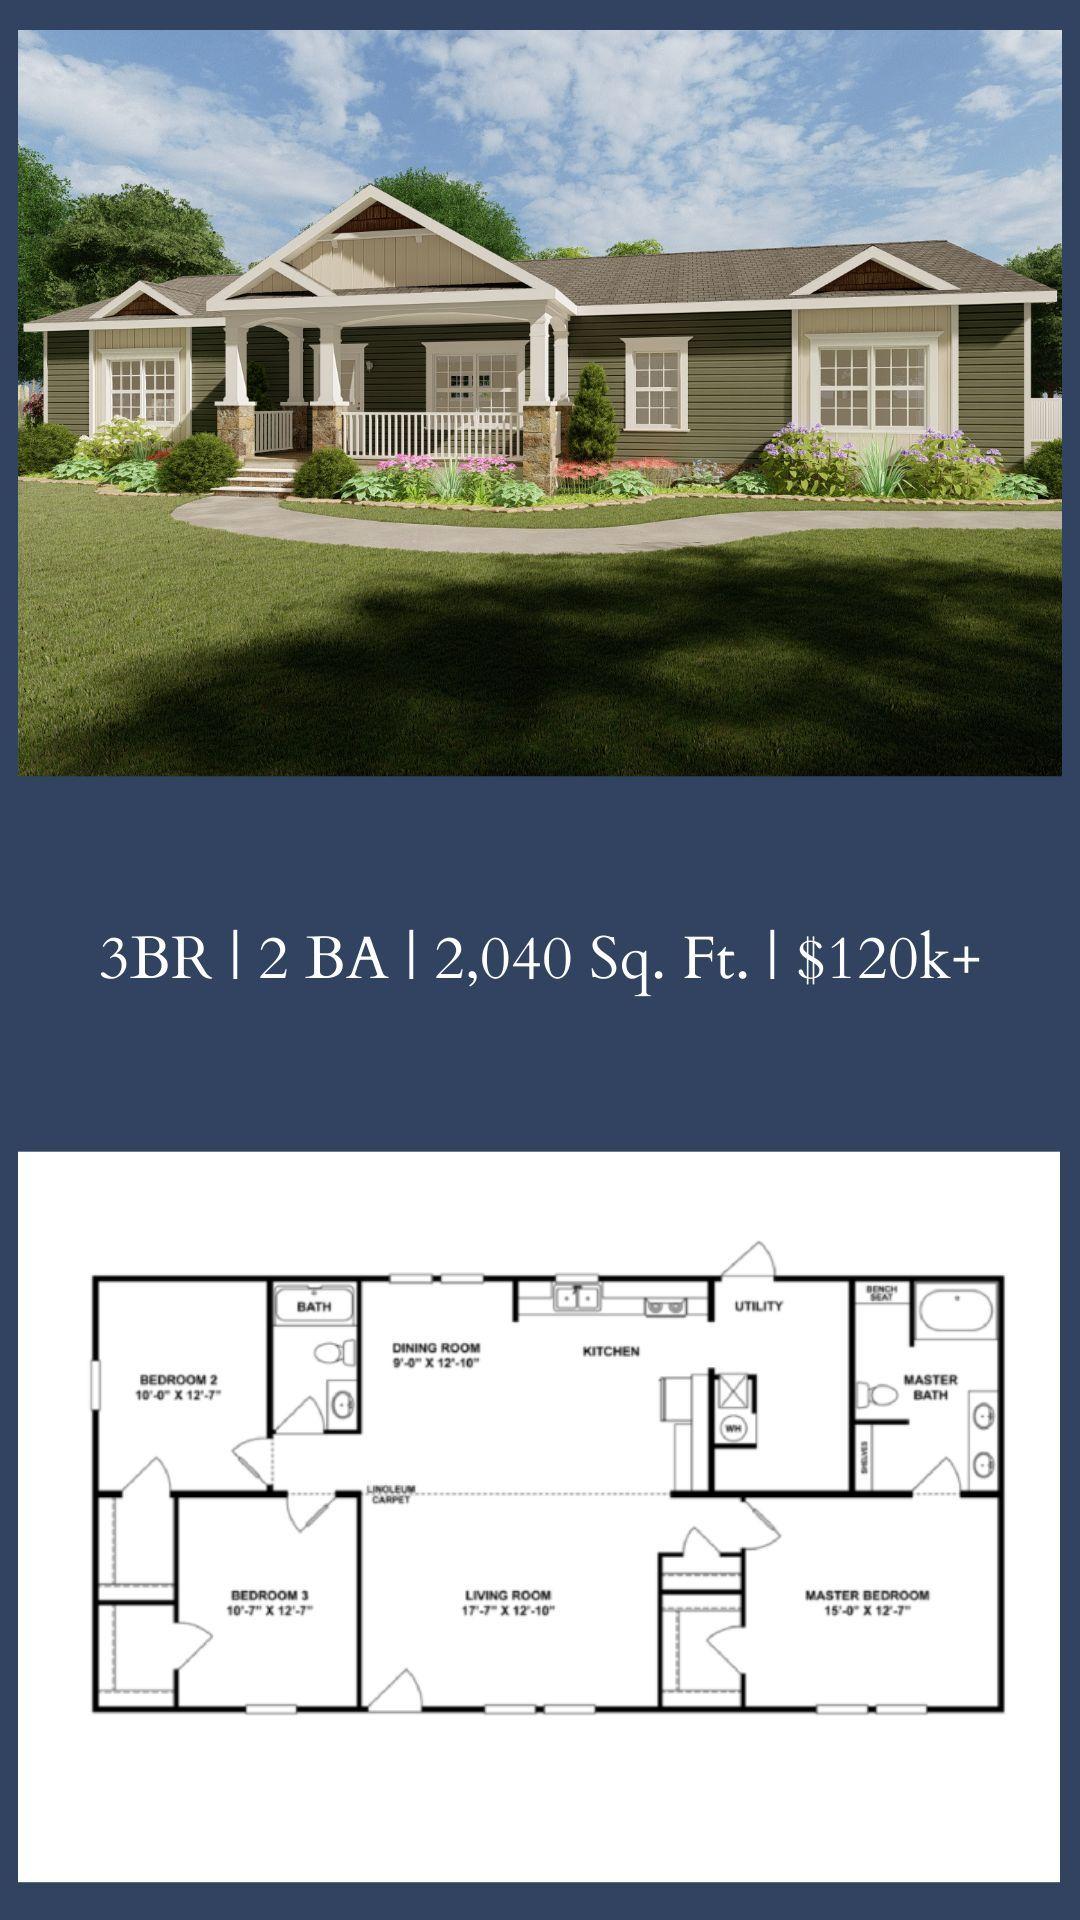 Click For 3d Tour Super 68 27spd32683ah Modular Home Plans Home Building Tips Mobile Home Floor Plans